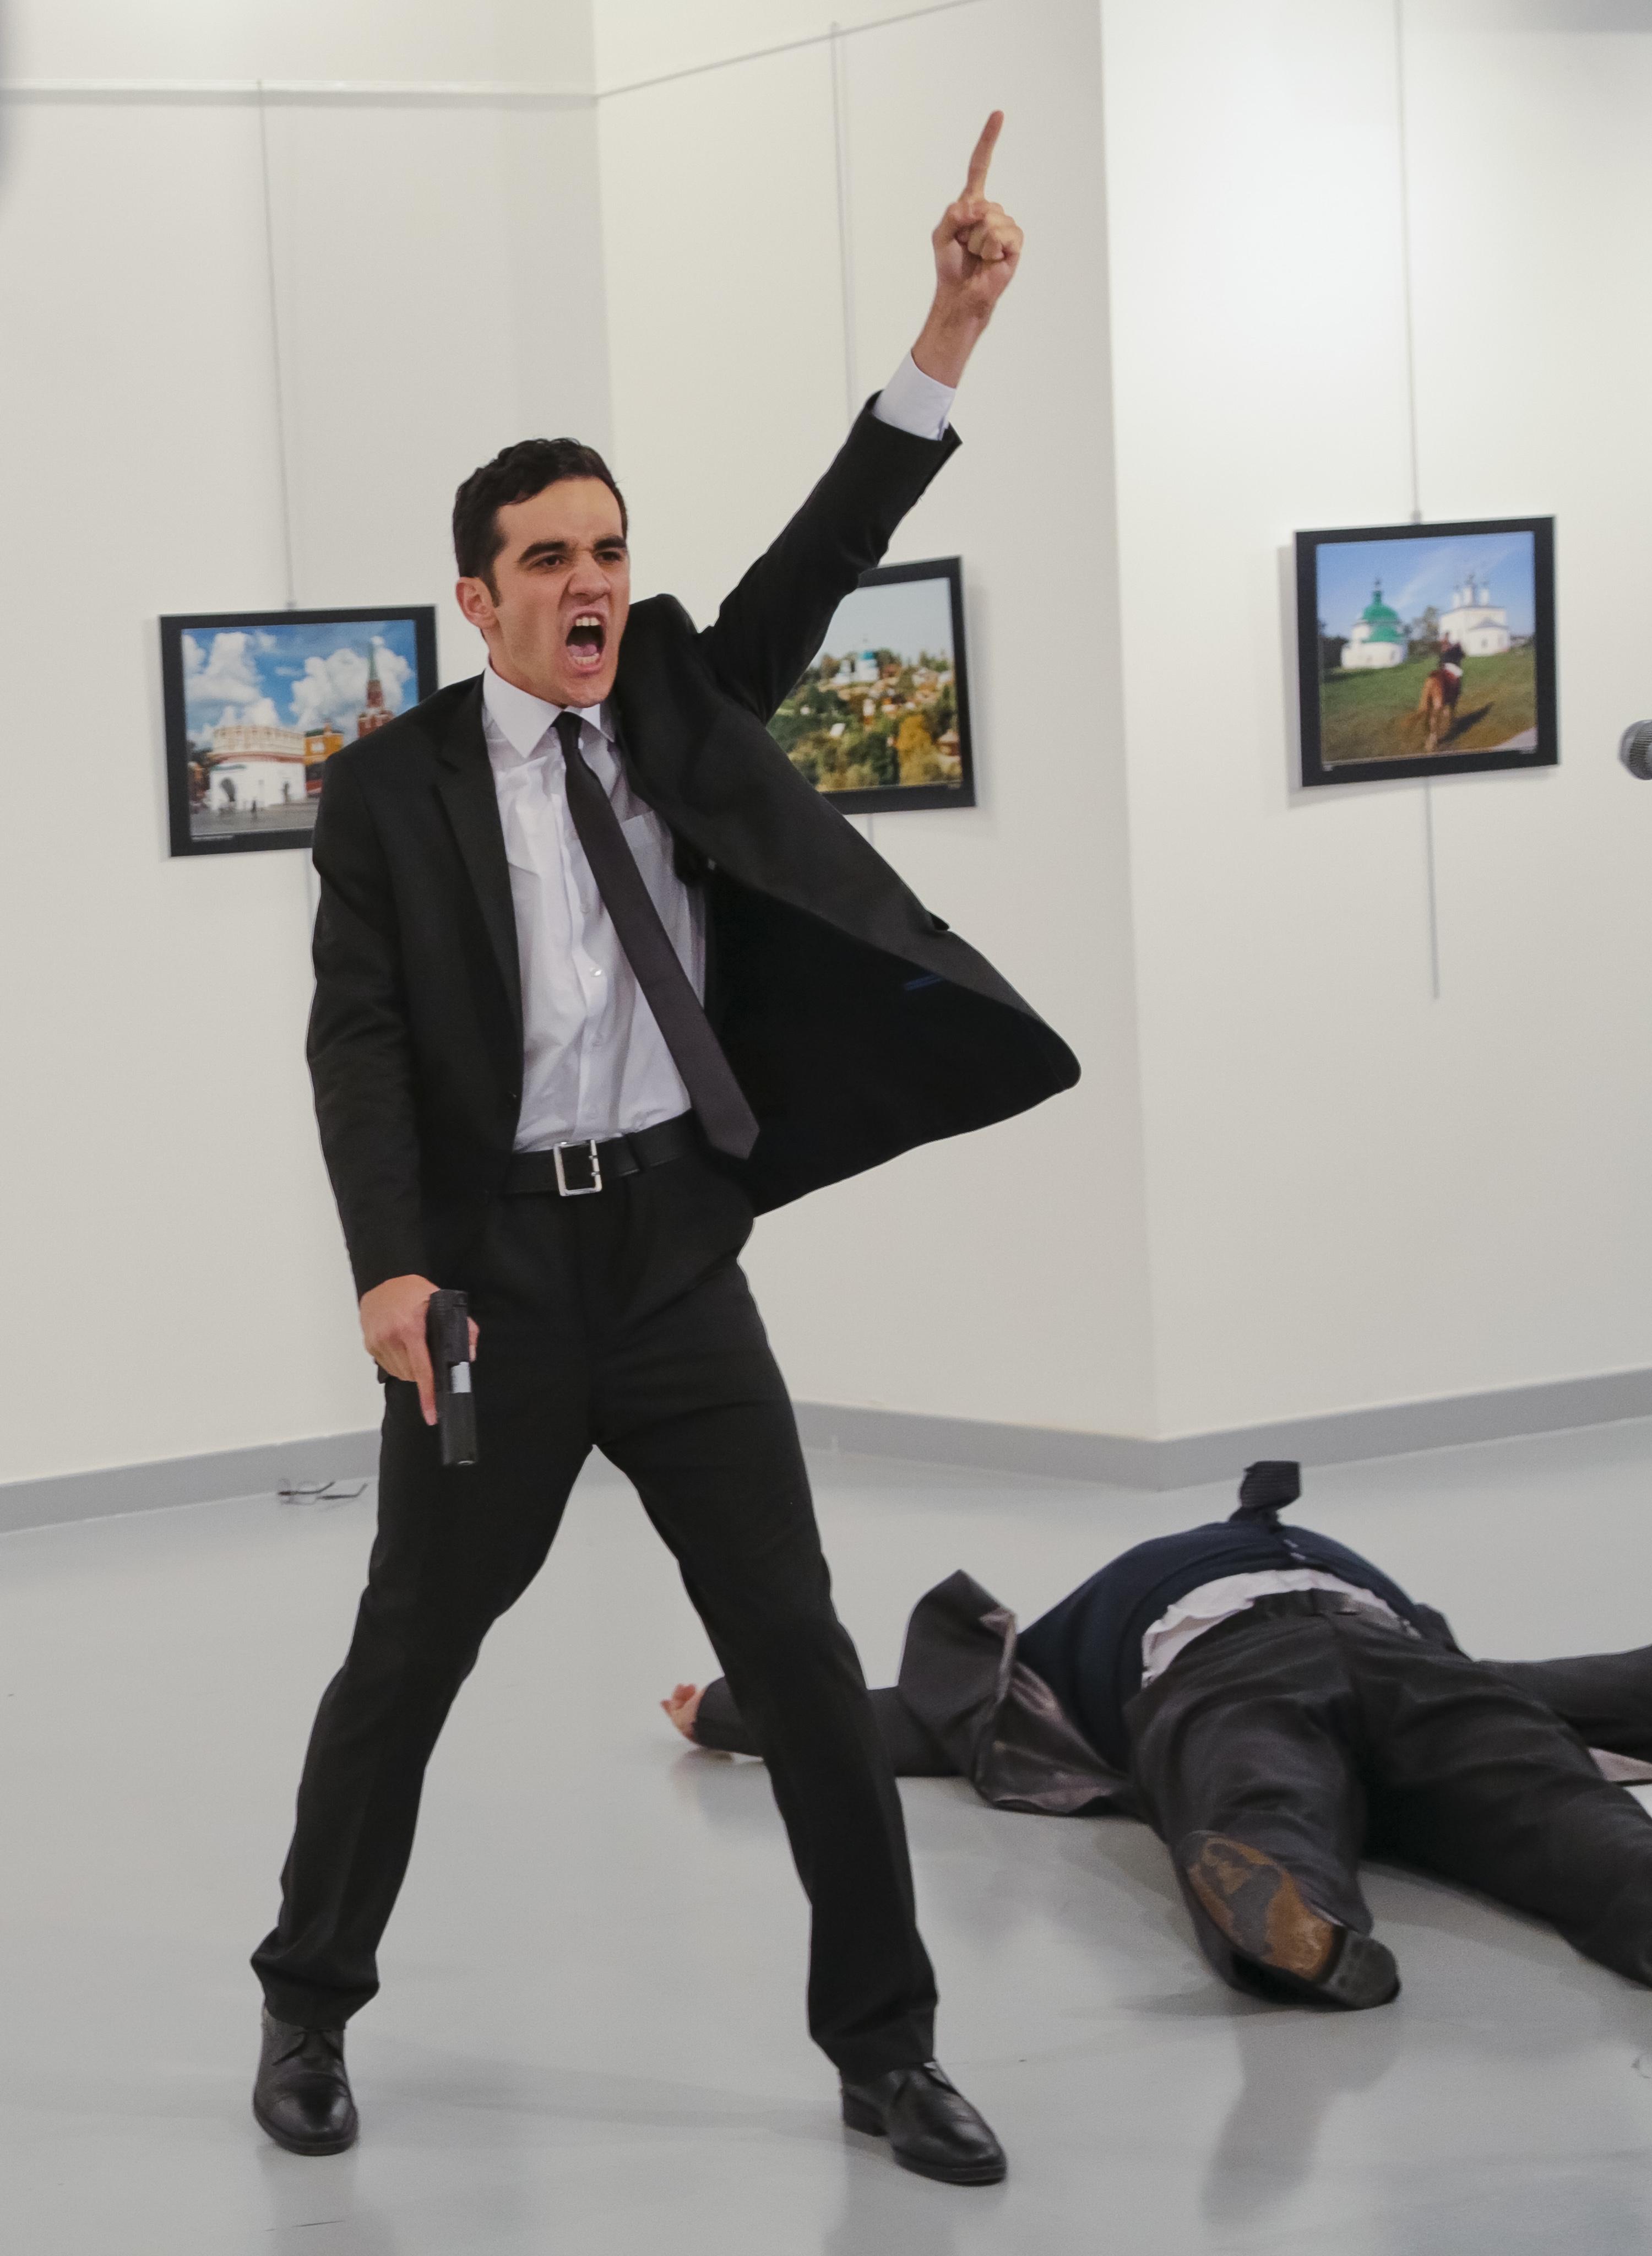 A gunman just assassinated Russia's ambassador to Turkey